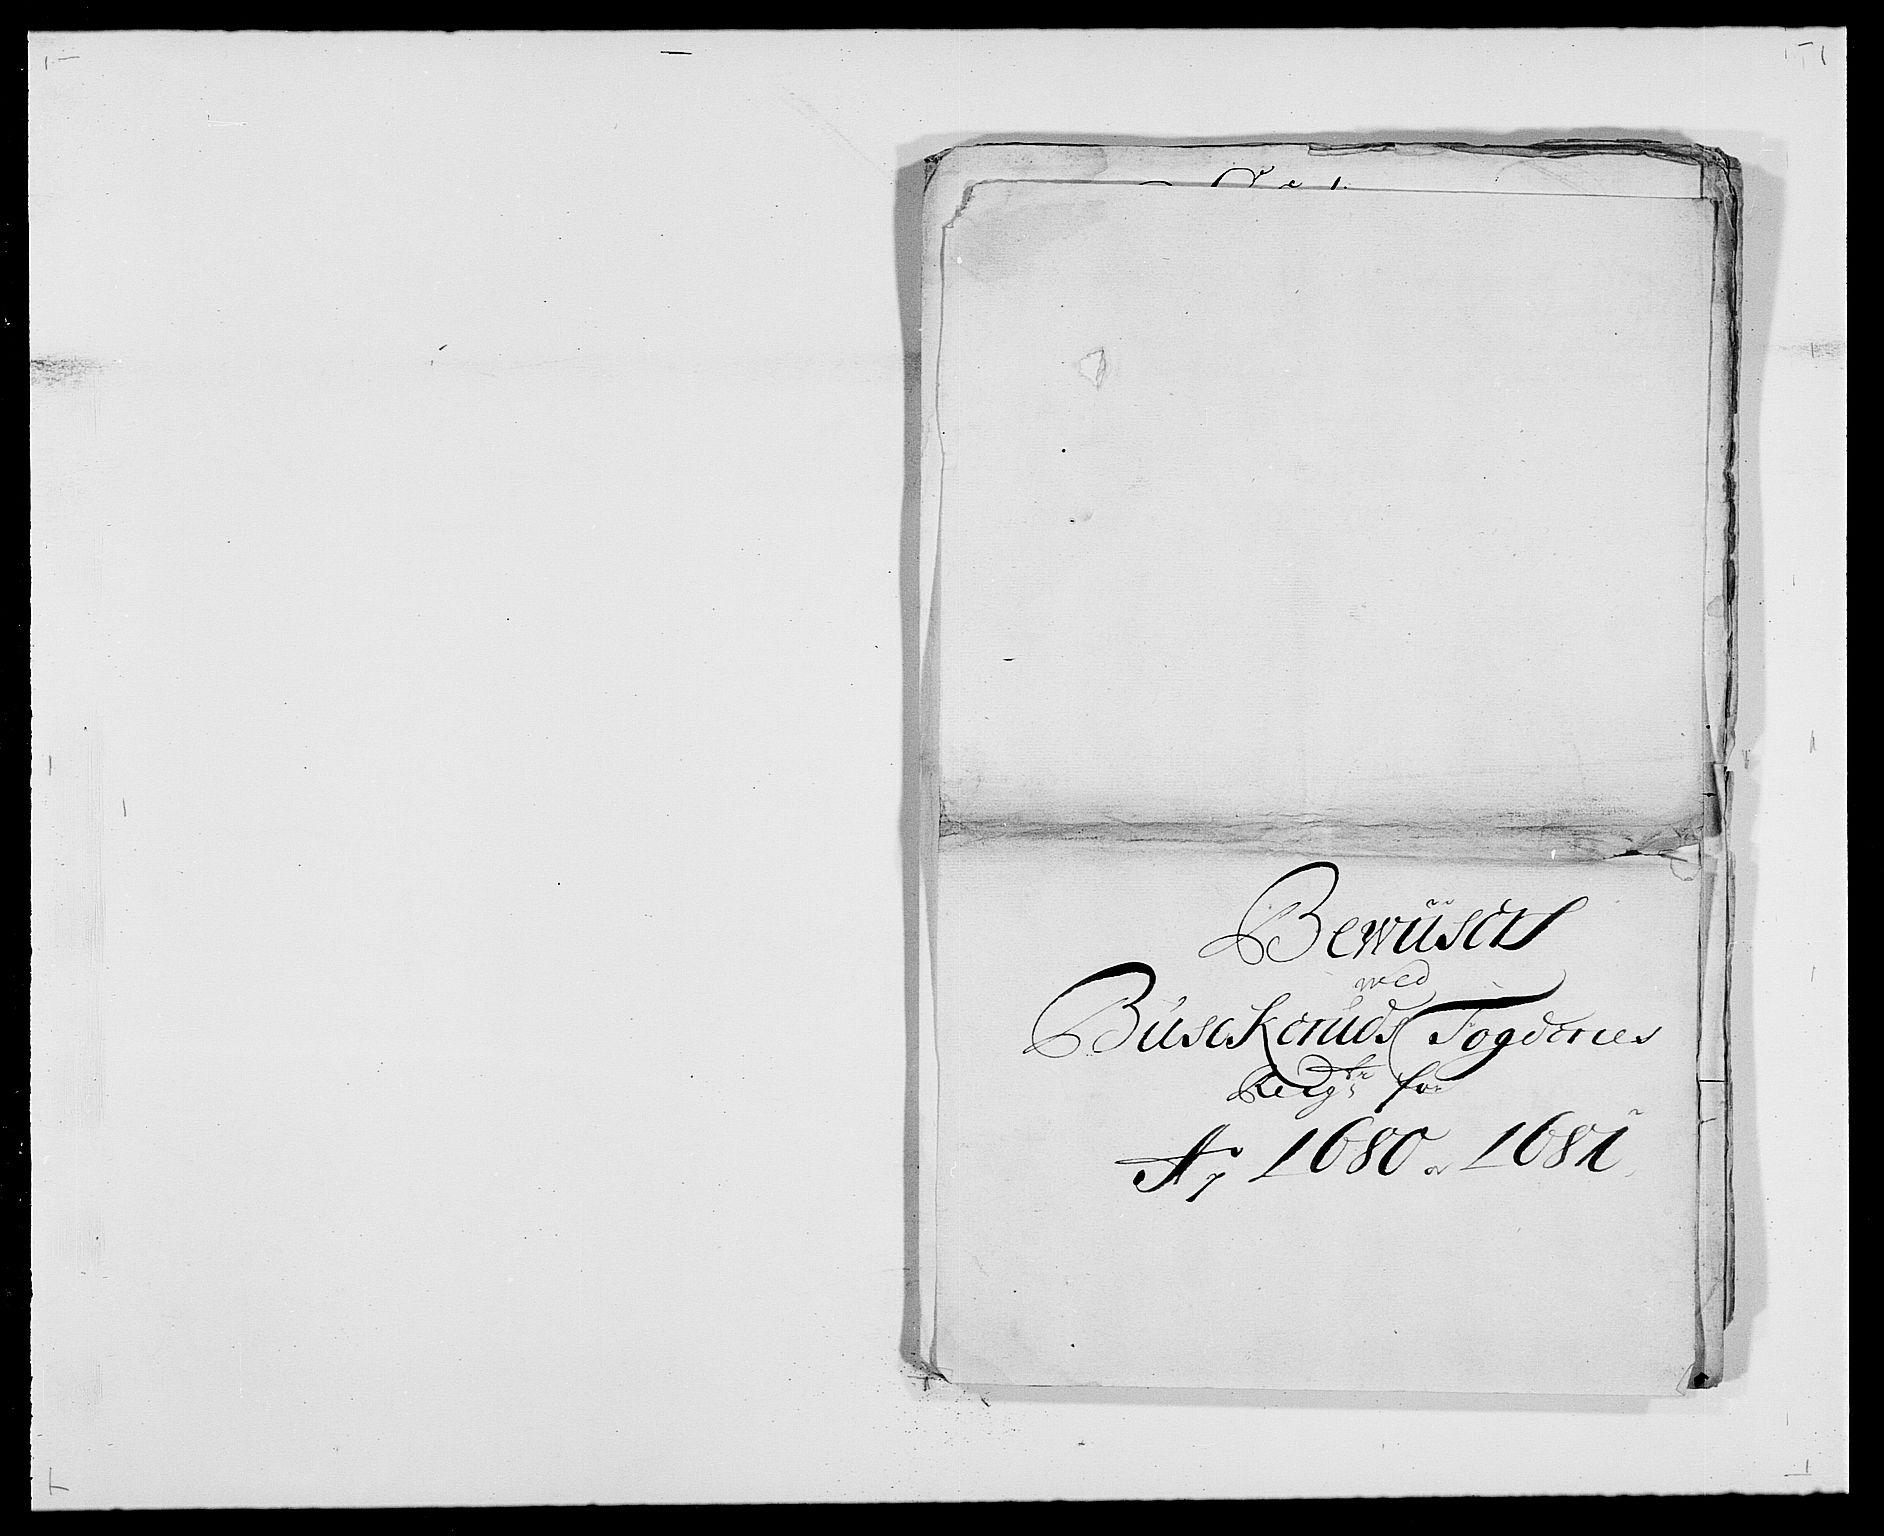 RA, Rentekammeret inntil 1814, Reviderte regnskaper, Fogderegnskap, R25/L1675: Fogderegnskap Buskerud, 1678-1681, s. 366